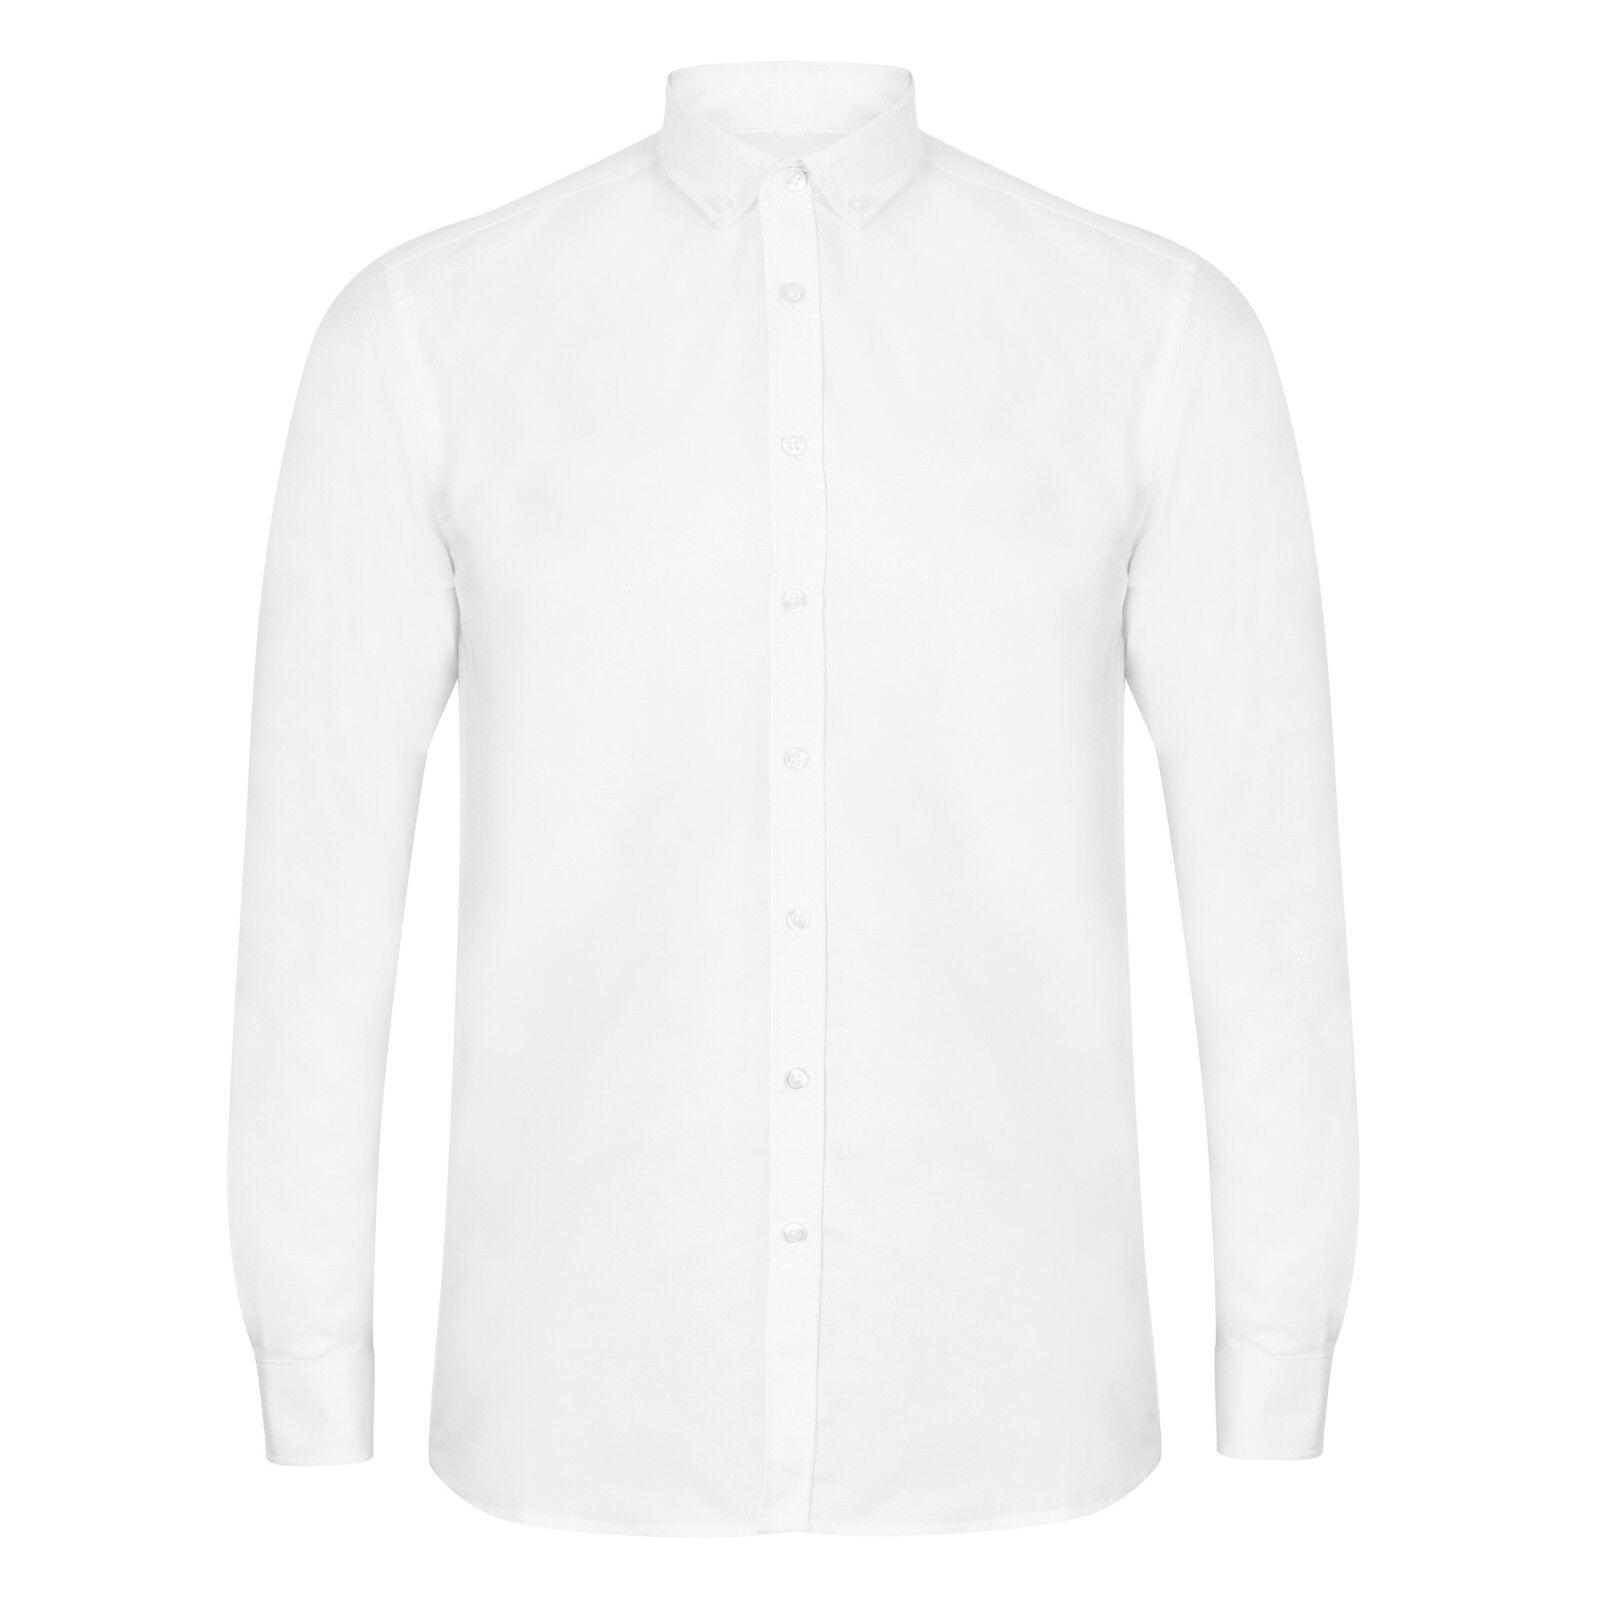 À Moderne xxl Shirt S Oxford H512s Homme Slim Henbury Longues Manches 5q4MEpfCw